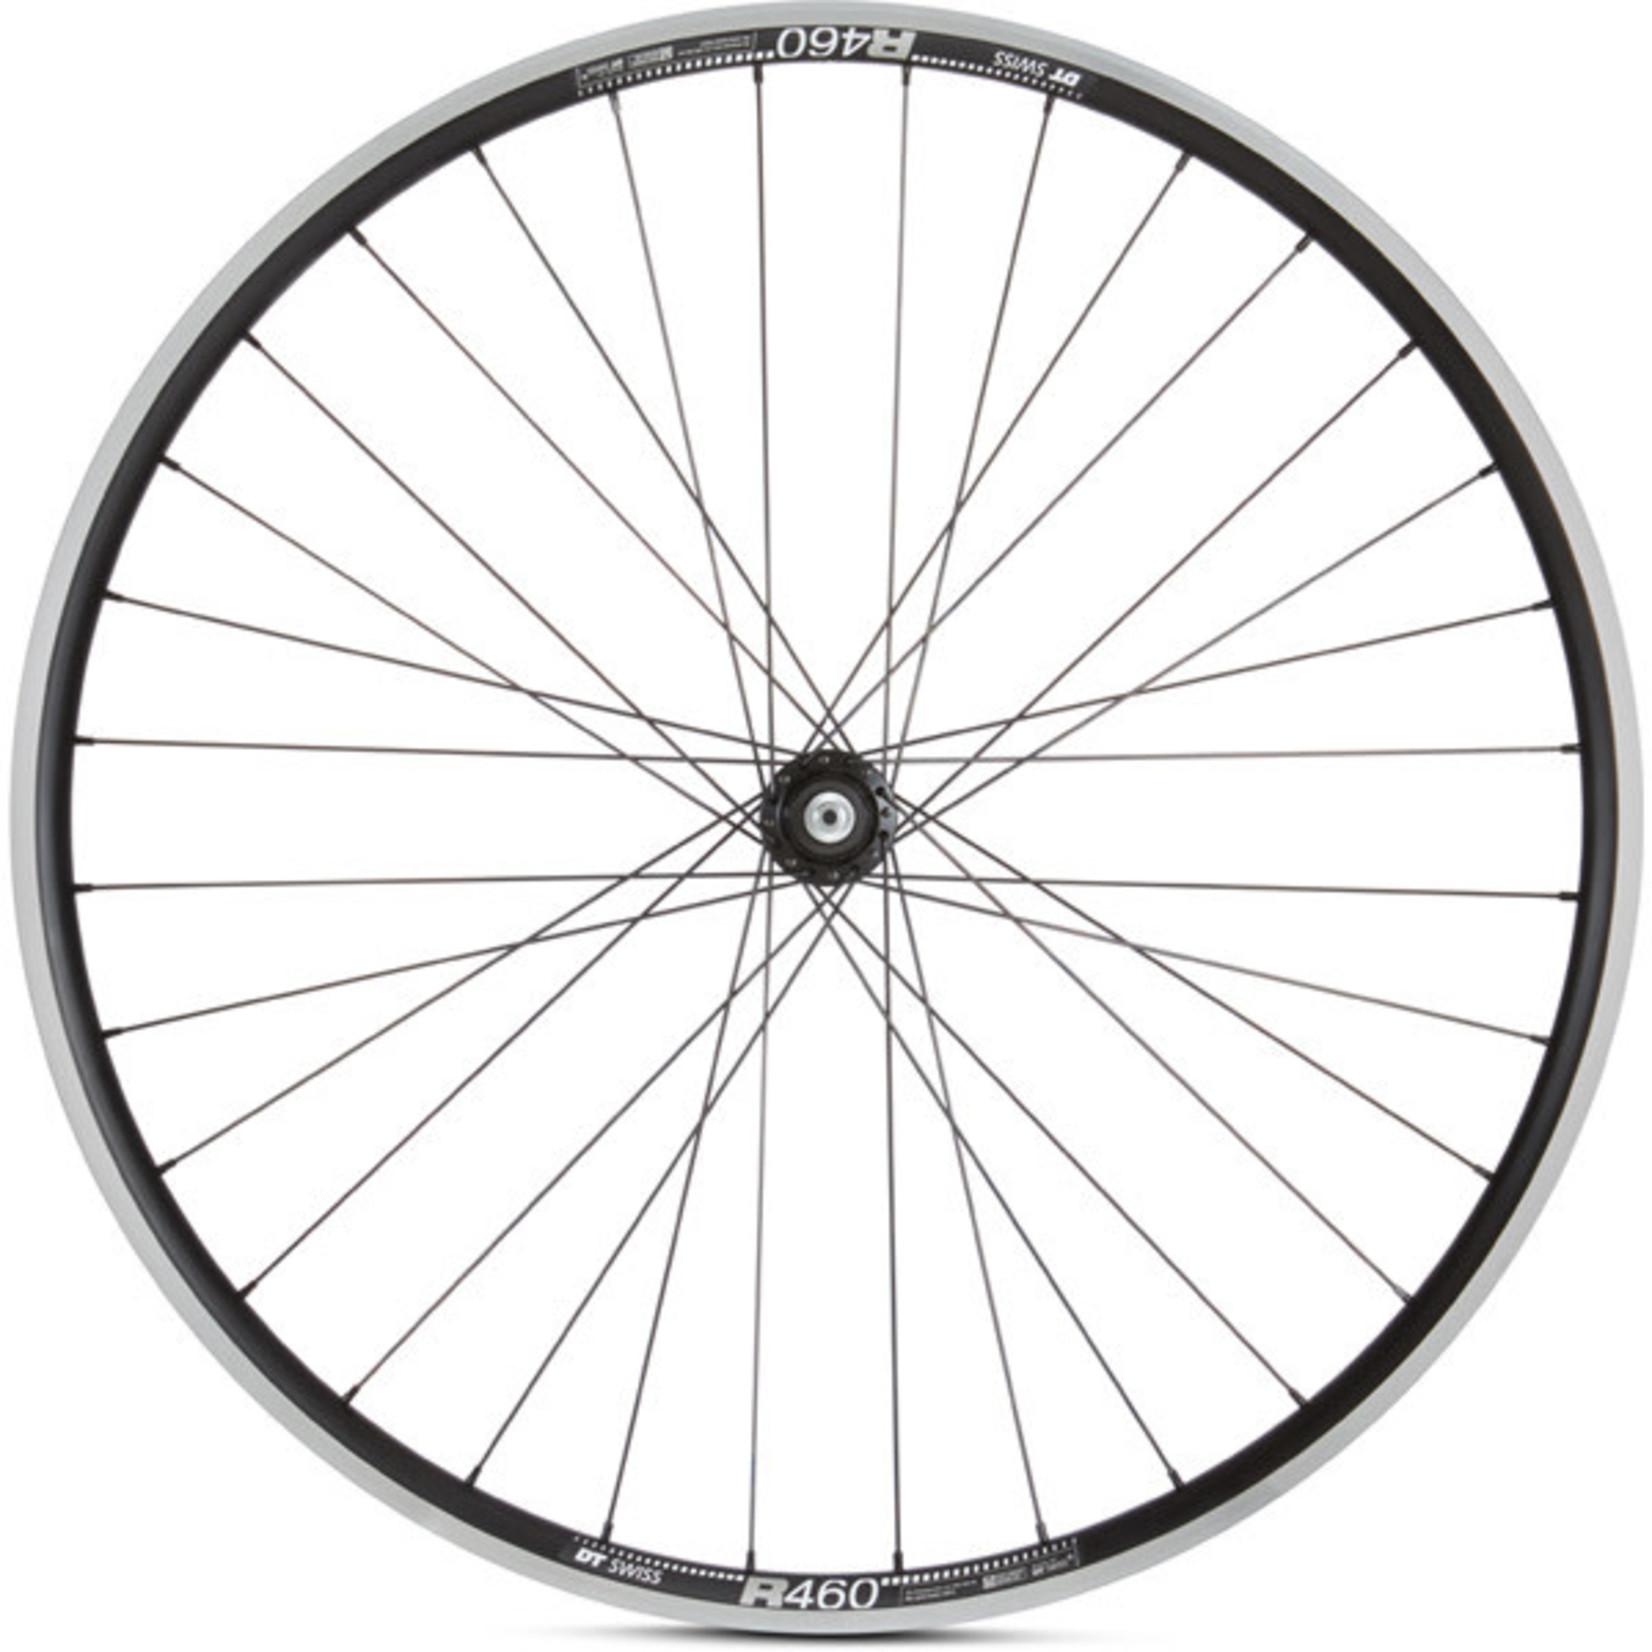 Road Rear Wheel Shimano 105 Hub DT R 460 Rim black 700c